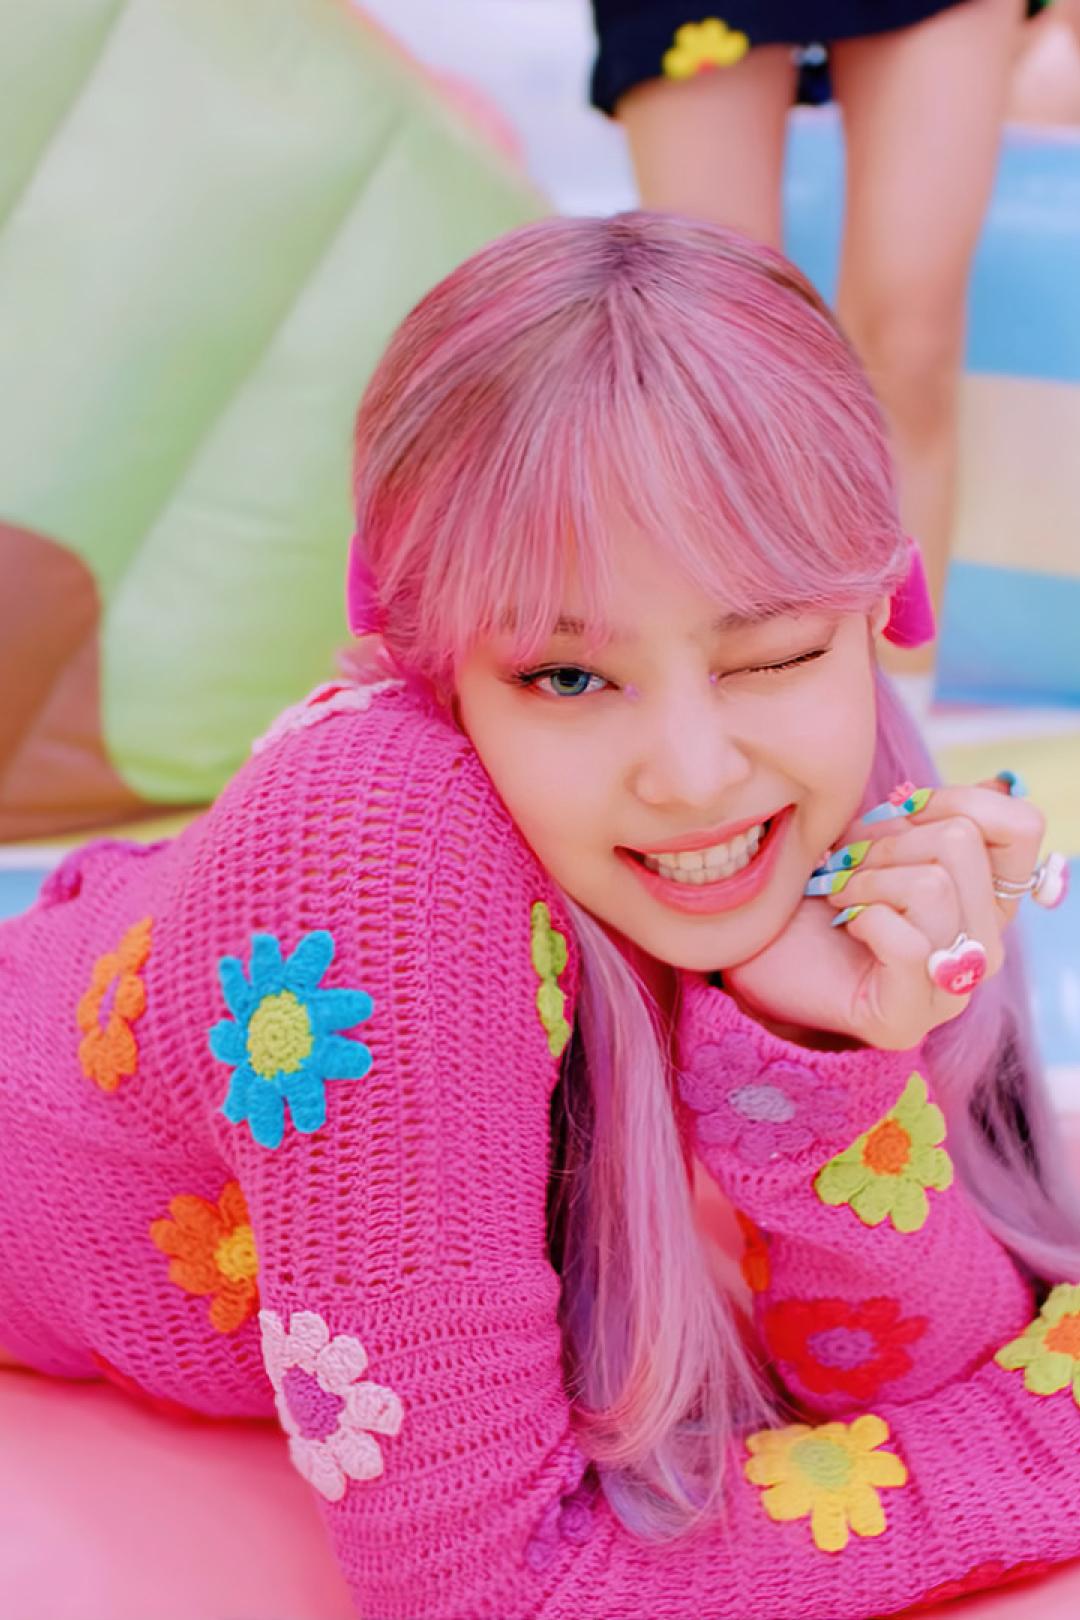 1080x1620 BLACKPINK Jennie Wink Pink Hair 1080x1620 ...